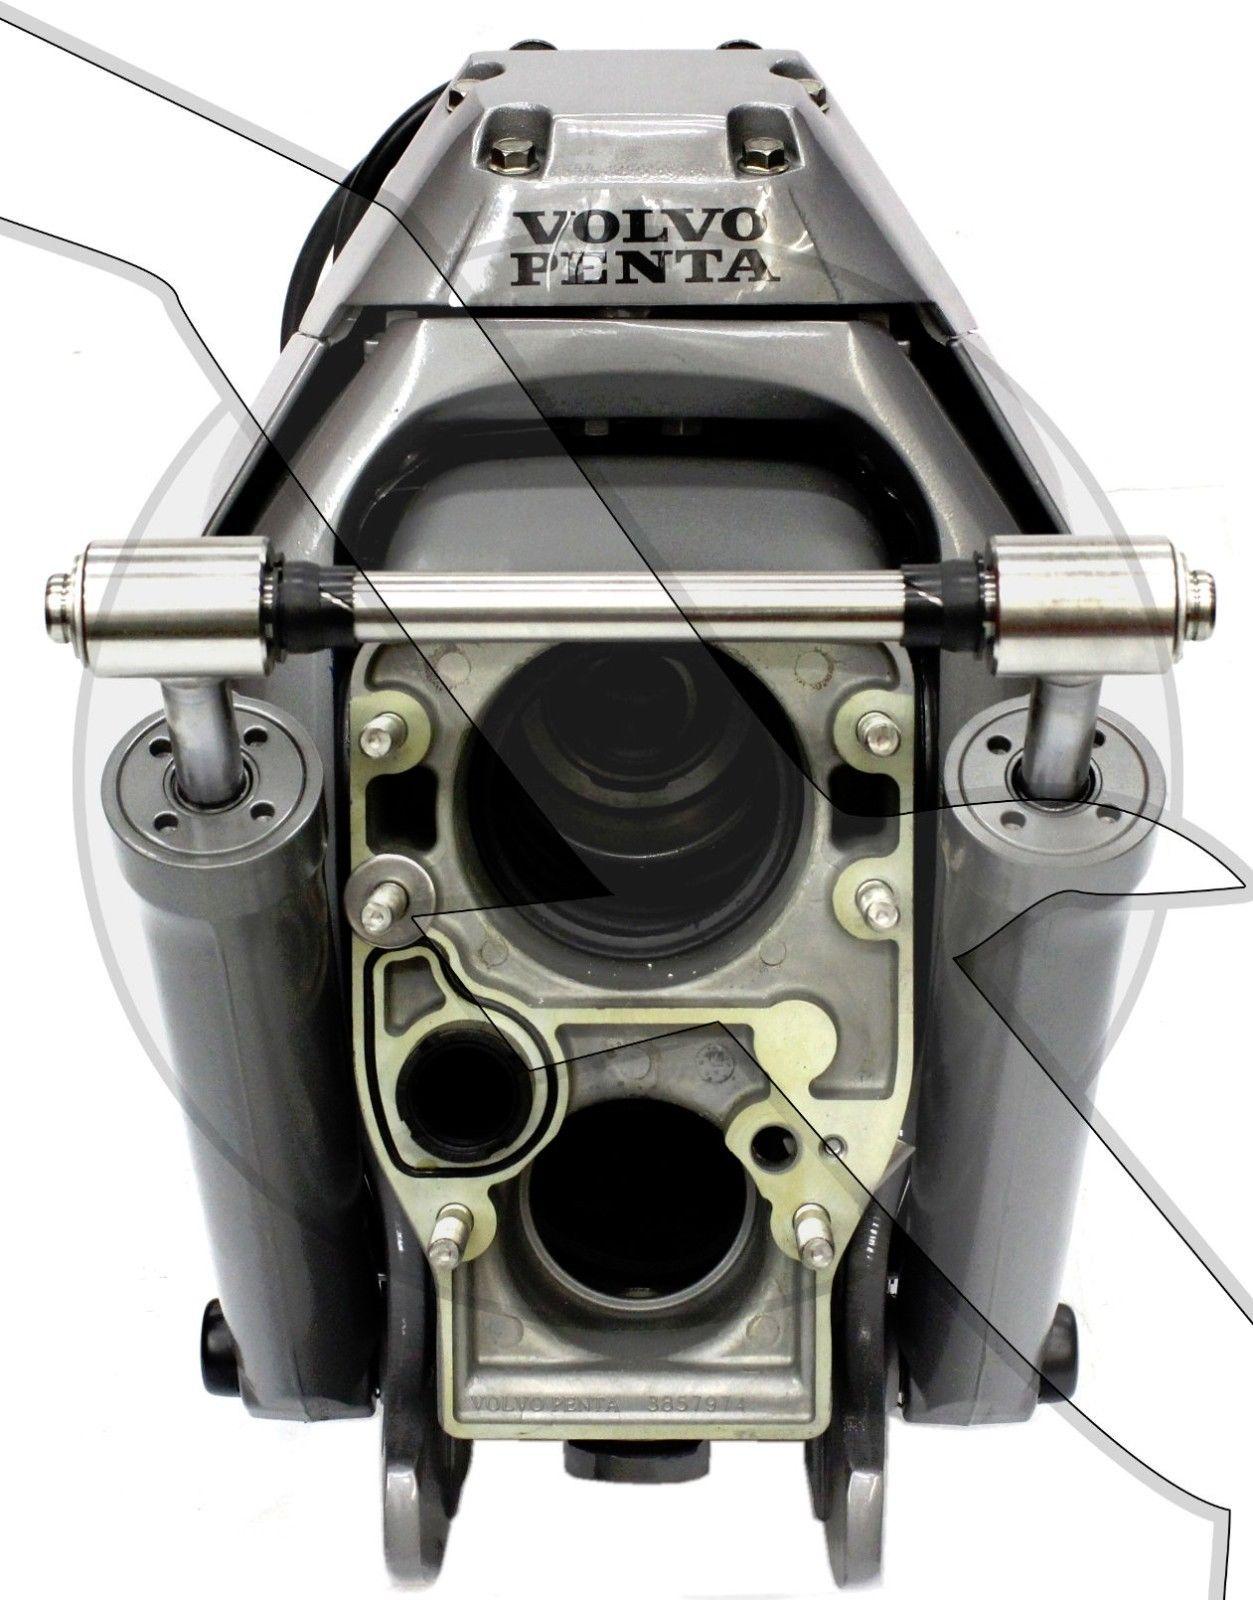 oem volvo mitsubishi amazon starter parts engine dp canada marine starters for penta